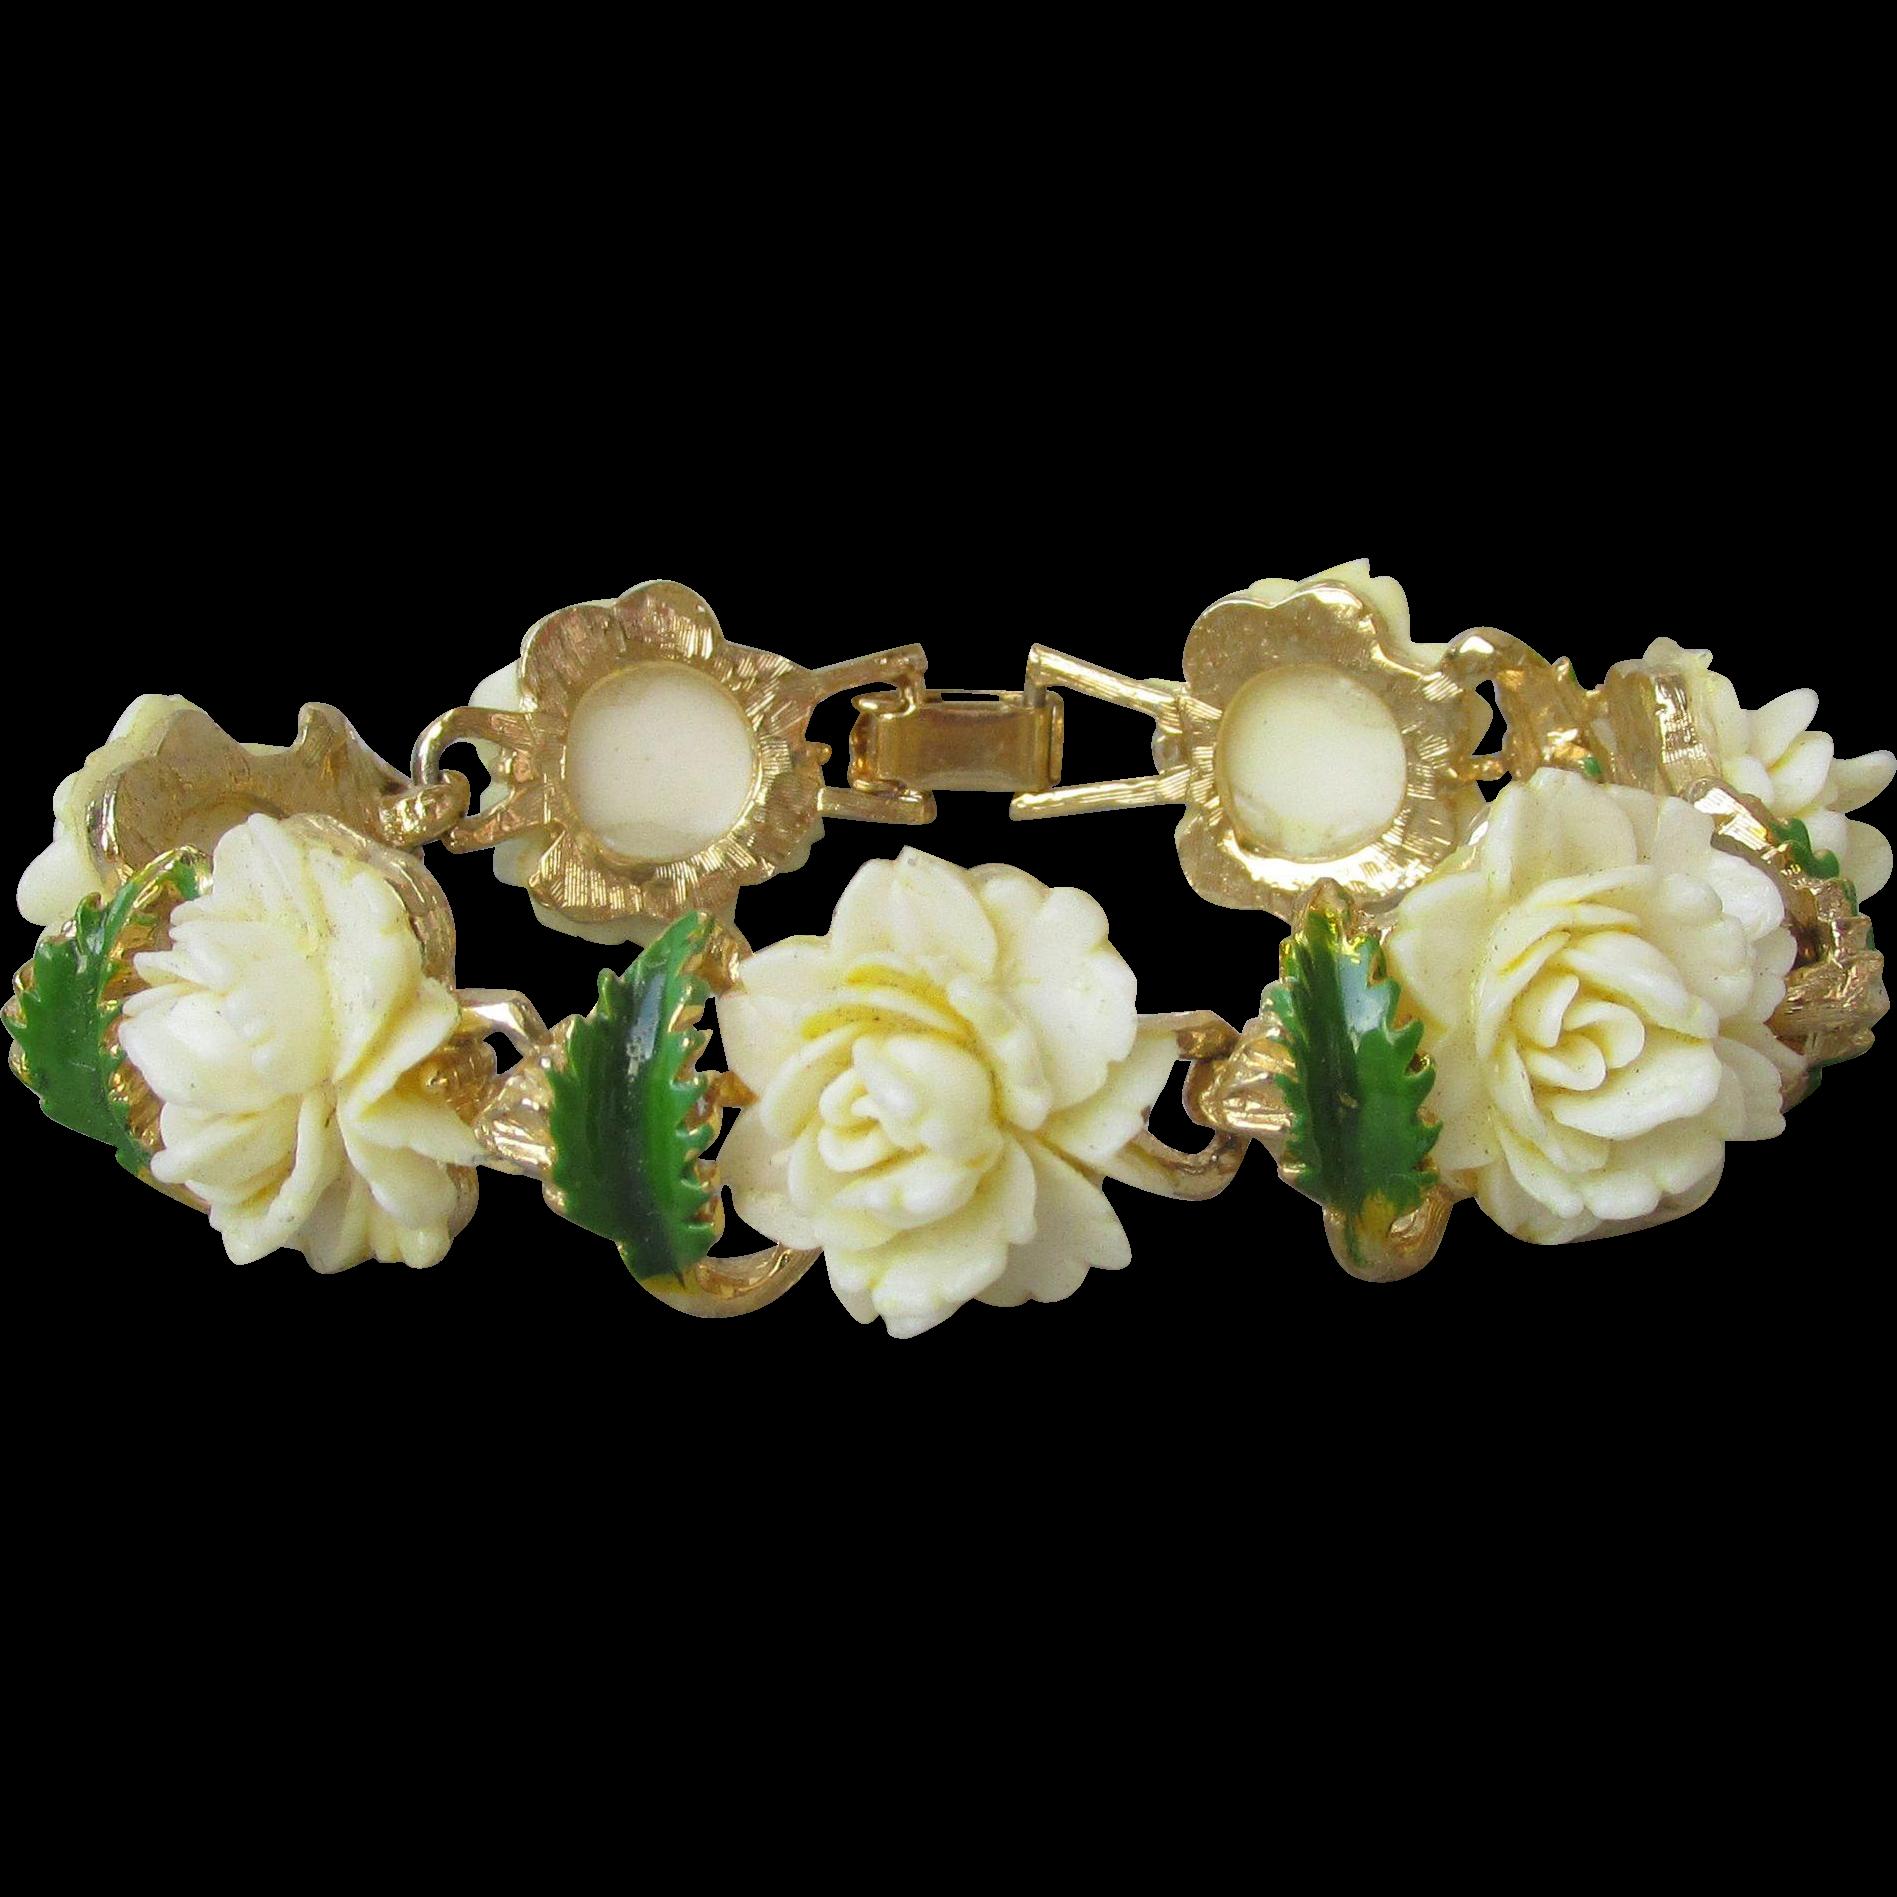 Pristine!  1960's Vintage Imitation Ivory Celluloid Roses & Green Enamel Bracelet